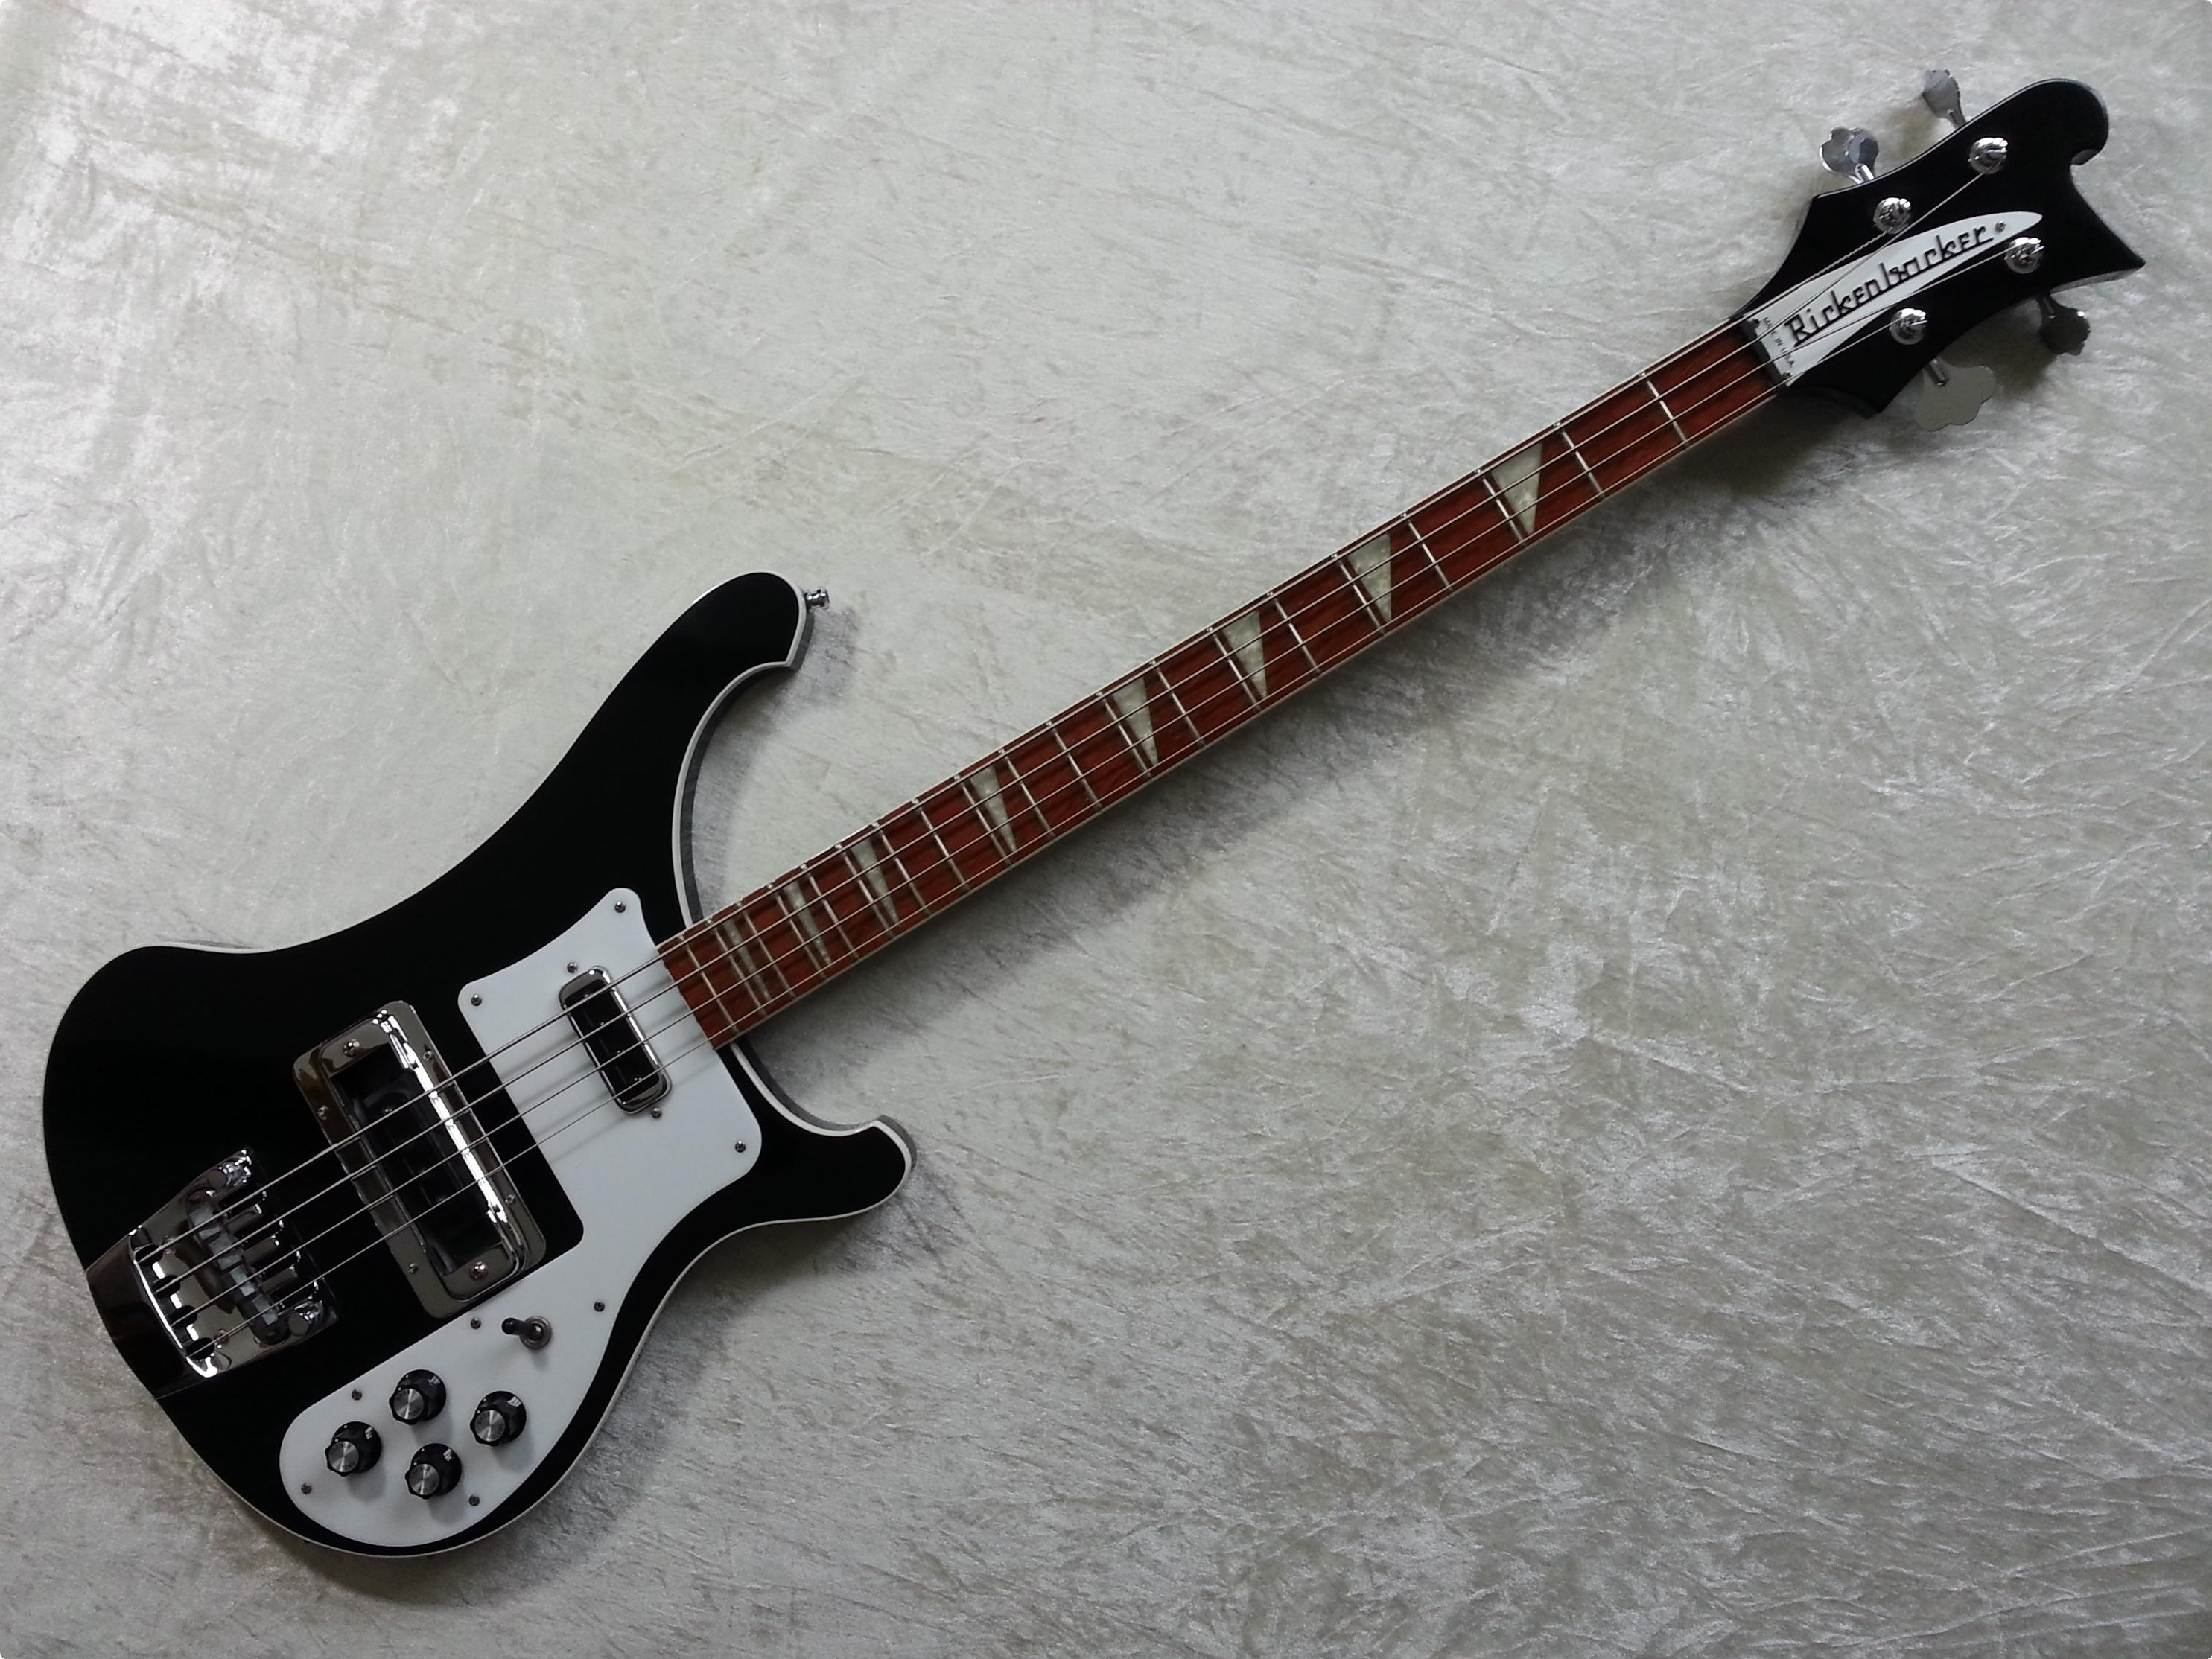 rickenbacker 4003 bass 2001 jetglo bass for sale cotswold bass guitars. Black Bedroom Furniture Sets. Home Design Ideas